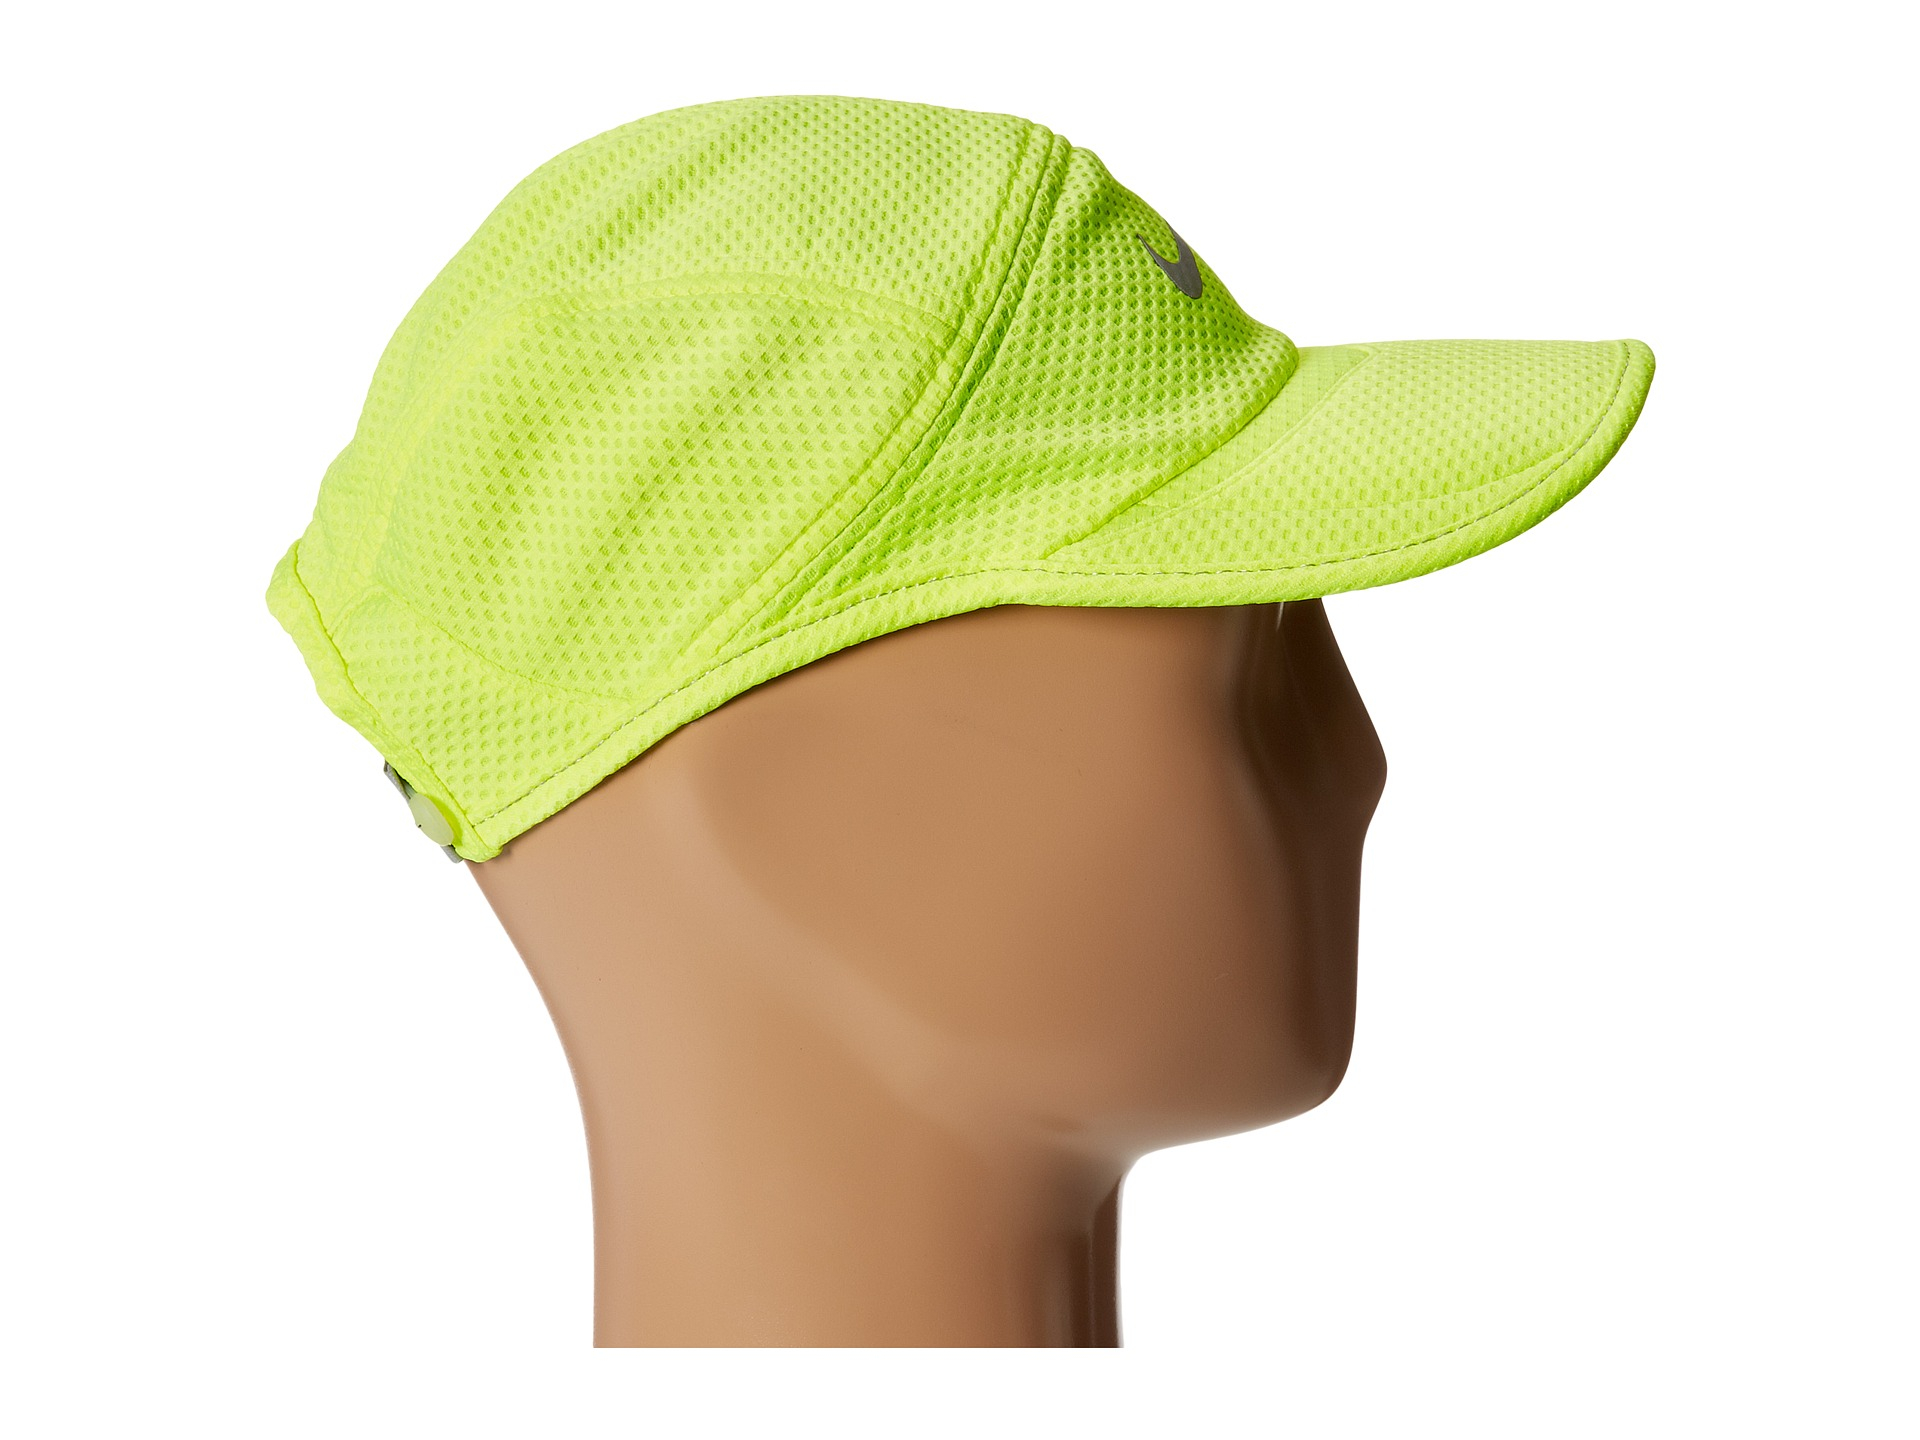 768965b66f446 Women's Yellow Ru Tw Mesh Daybreak Cap